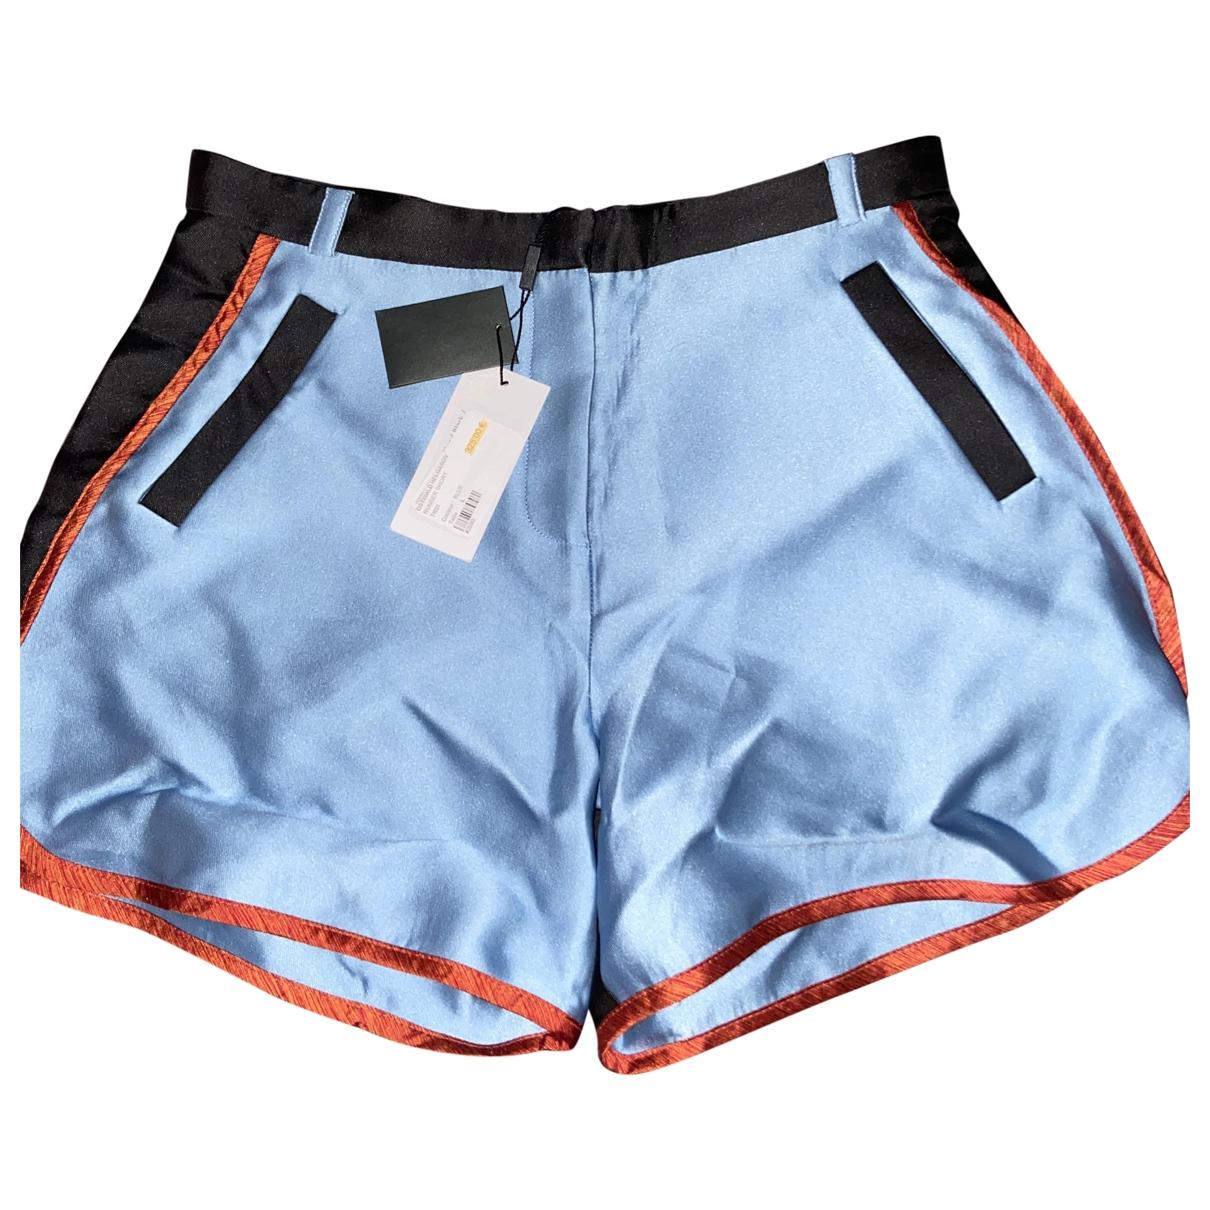 Ostwald Helgason \N Shorts in  Schwarz Polyester